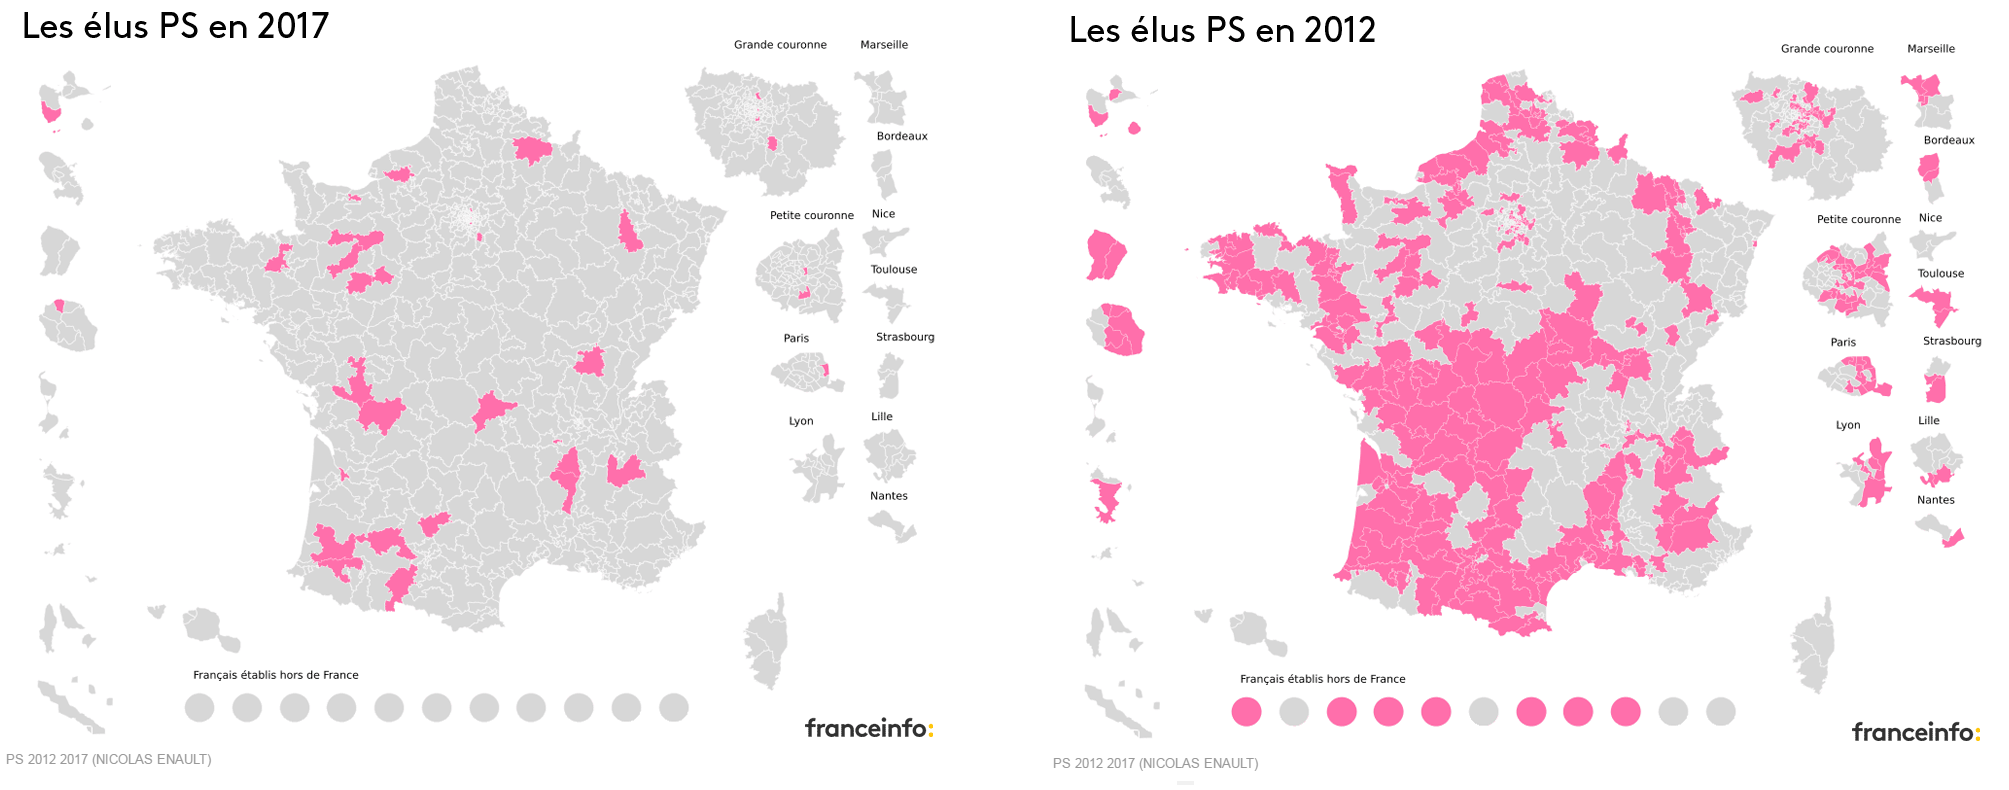 Le PS disparaît de la carte avec 29 circonscriptions, contre 280 en 2012